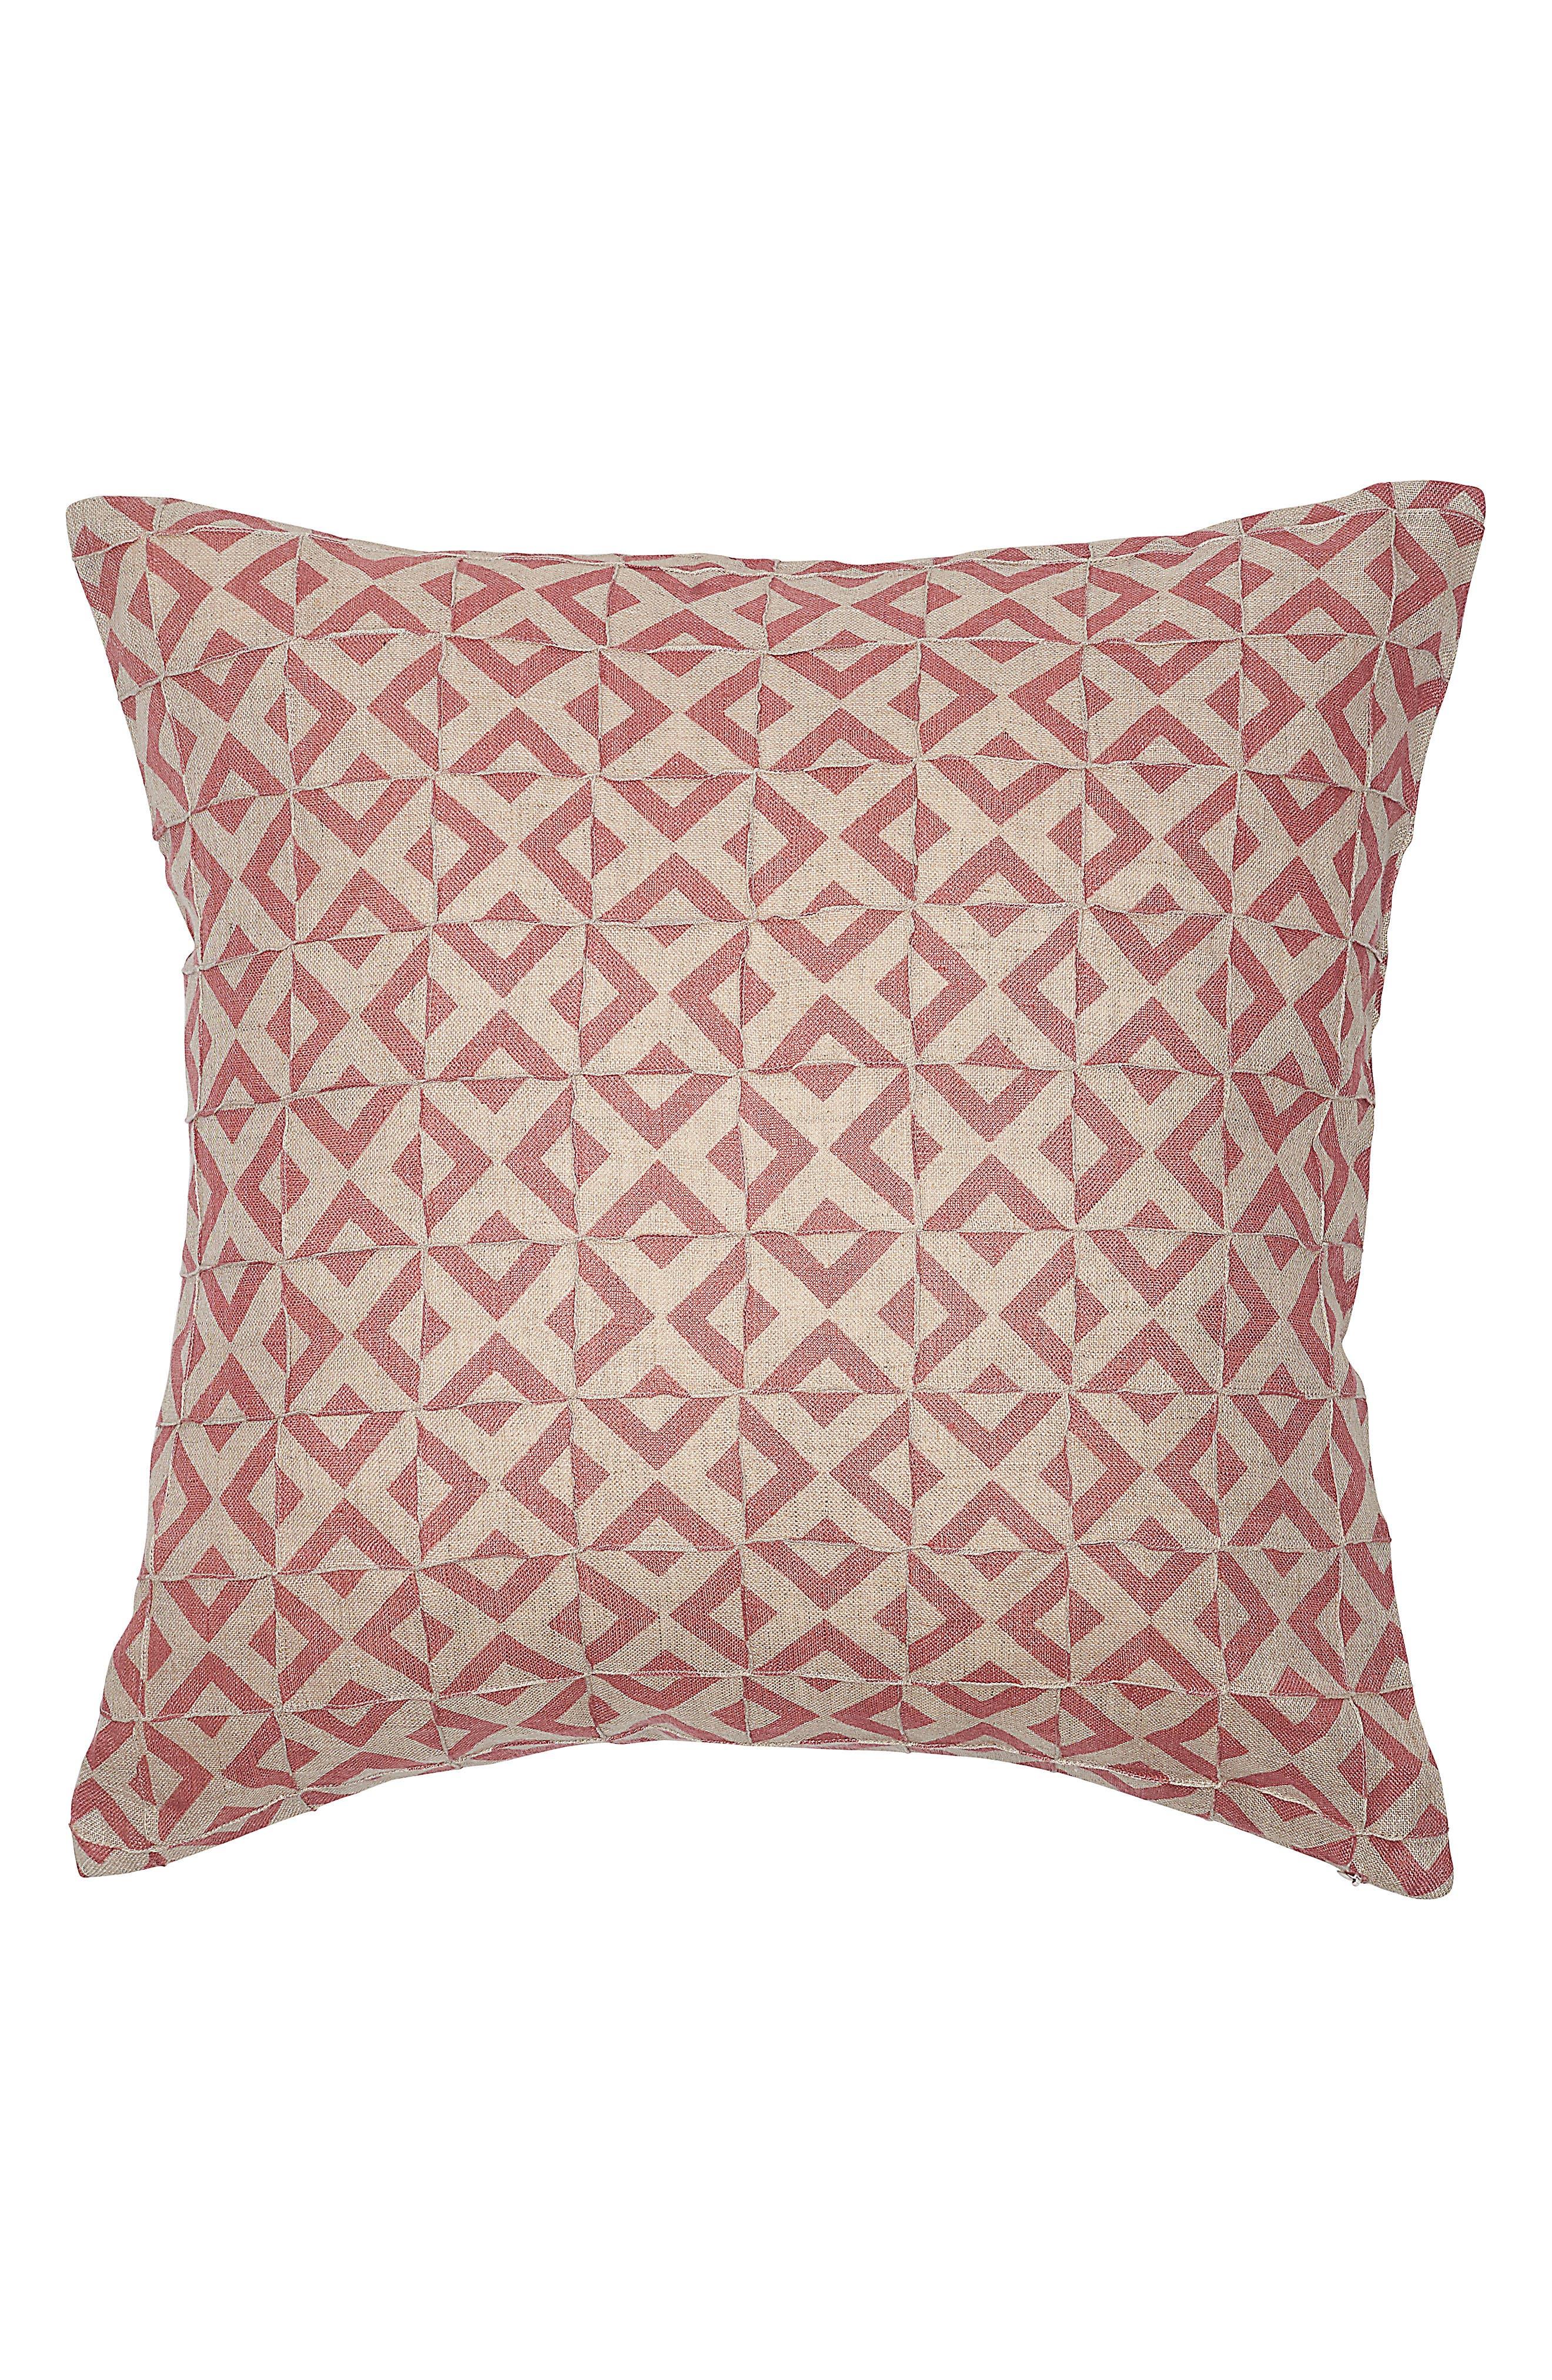 EADIE LIFESTYLE, Surrey Pintuck Linen Accent Pillow, Main thumbnail 1, color, DUSTY ROSE MULTI